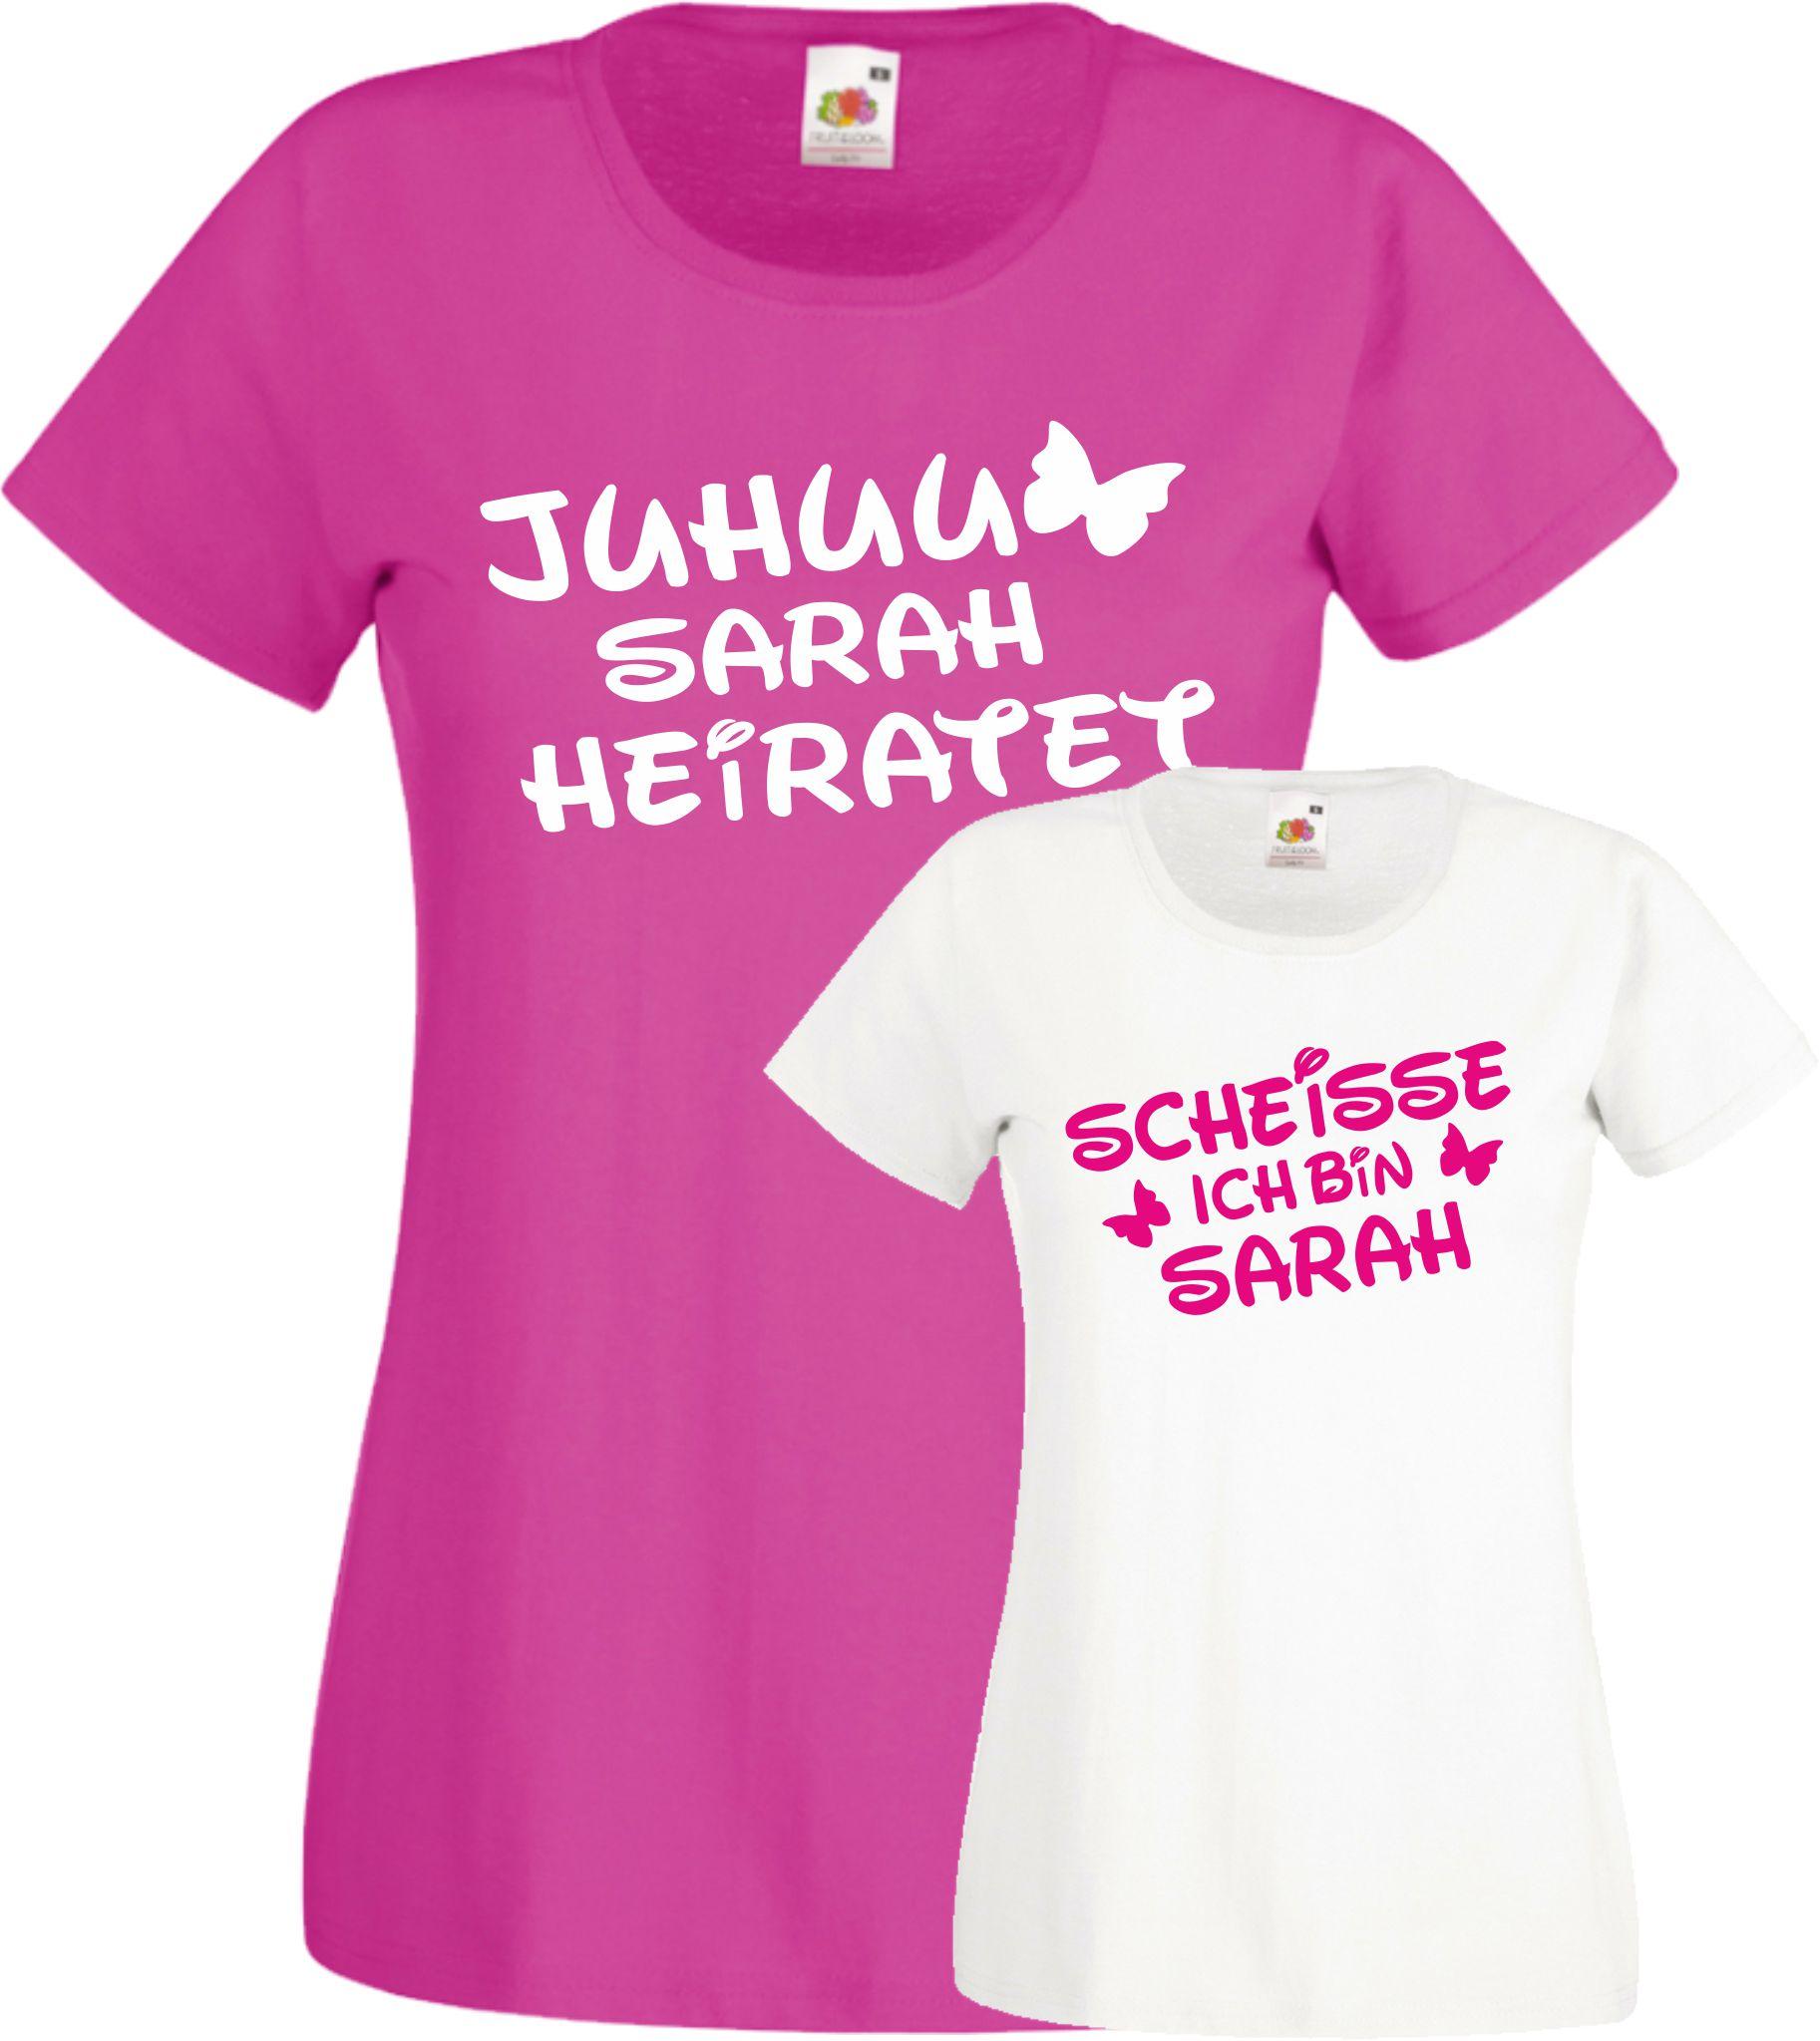 Juhu Wunschname heiratet süßes Jga TShirts Damen Shirt Braut Hochzeit Fun